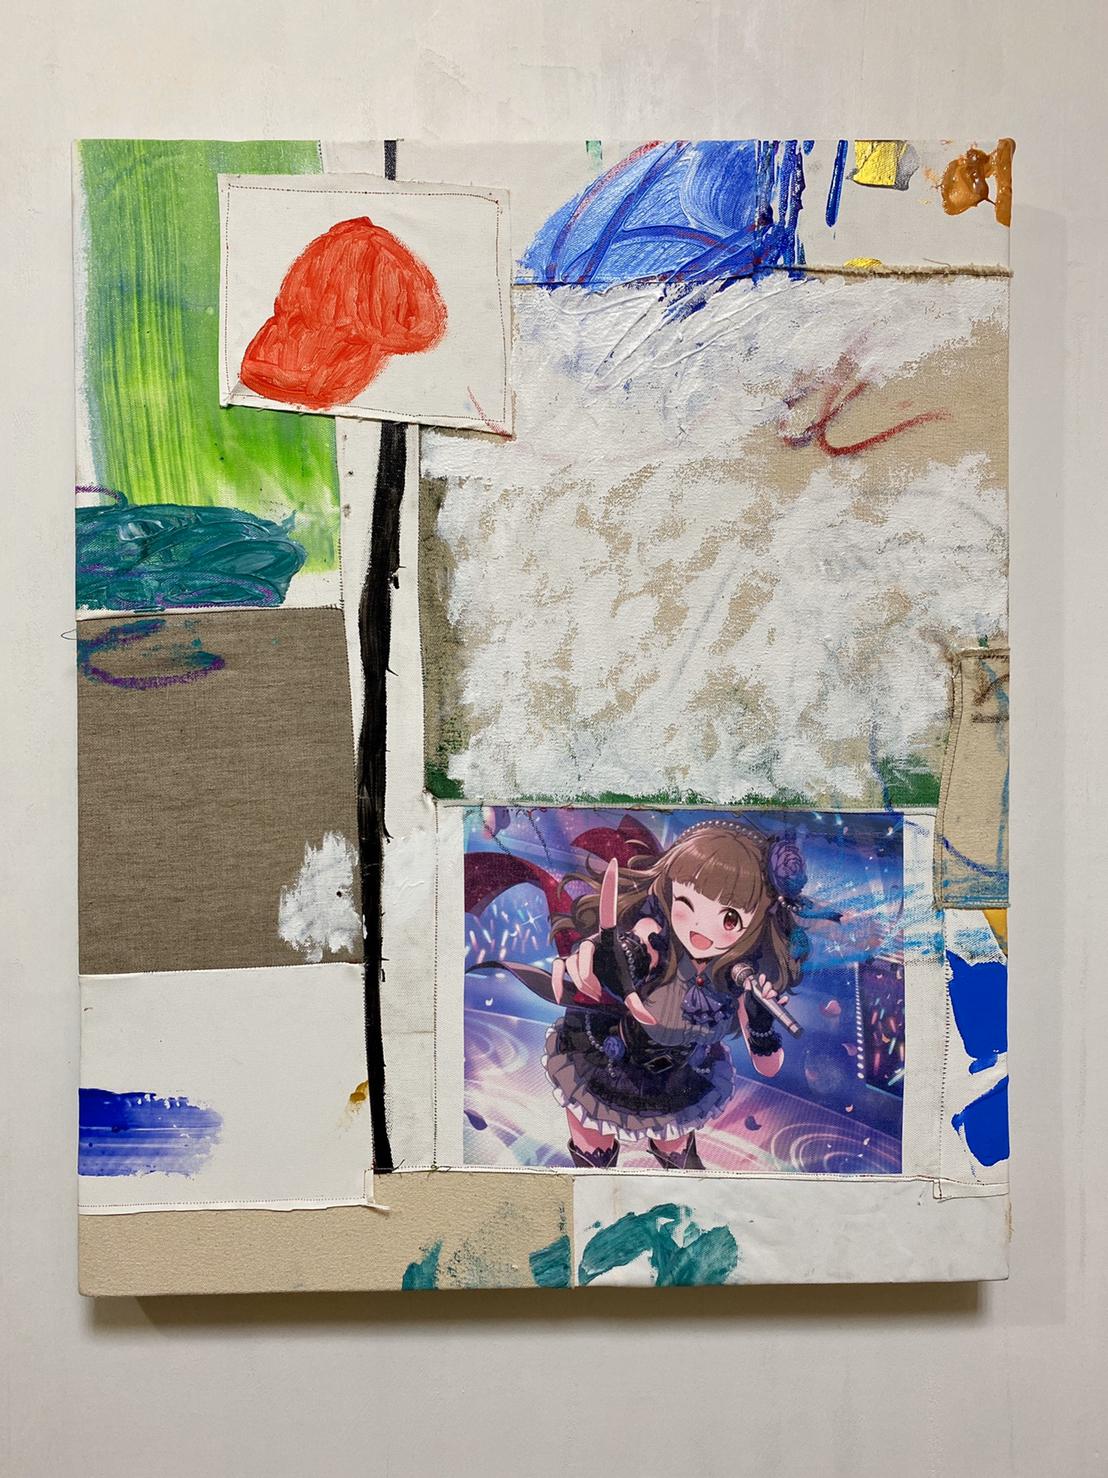 untitled (オーバーザレインボー 神谷奈緒)